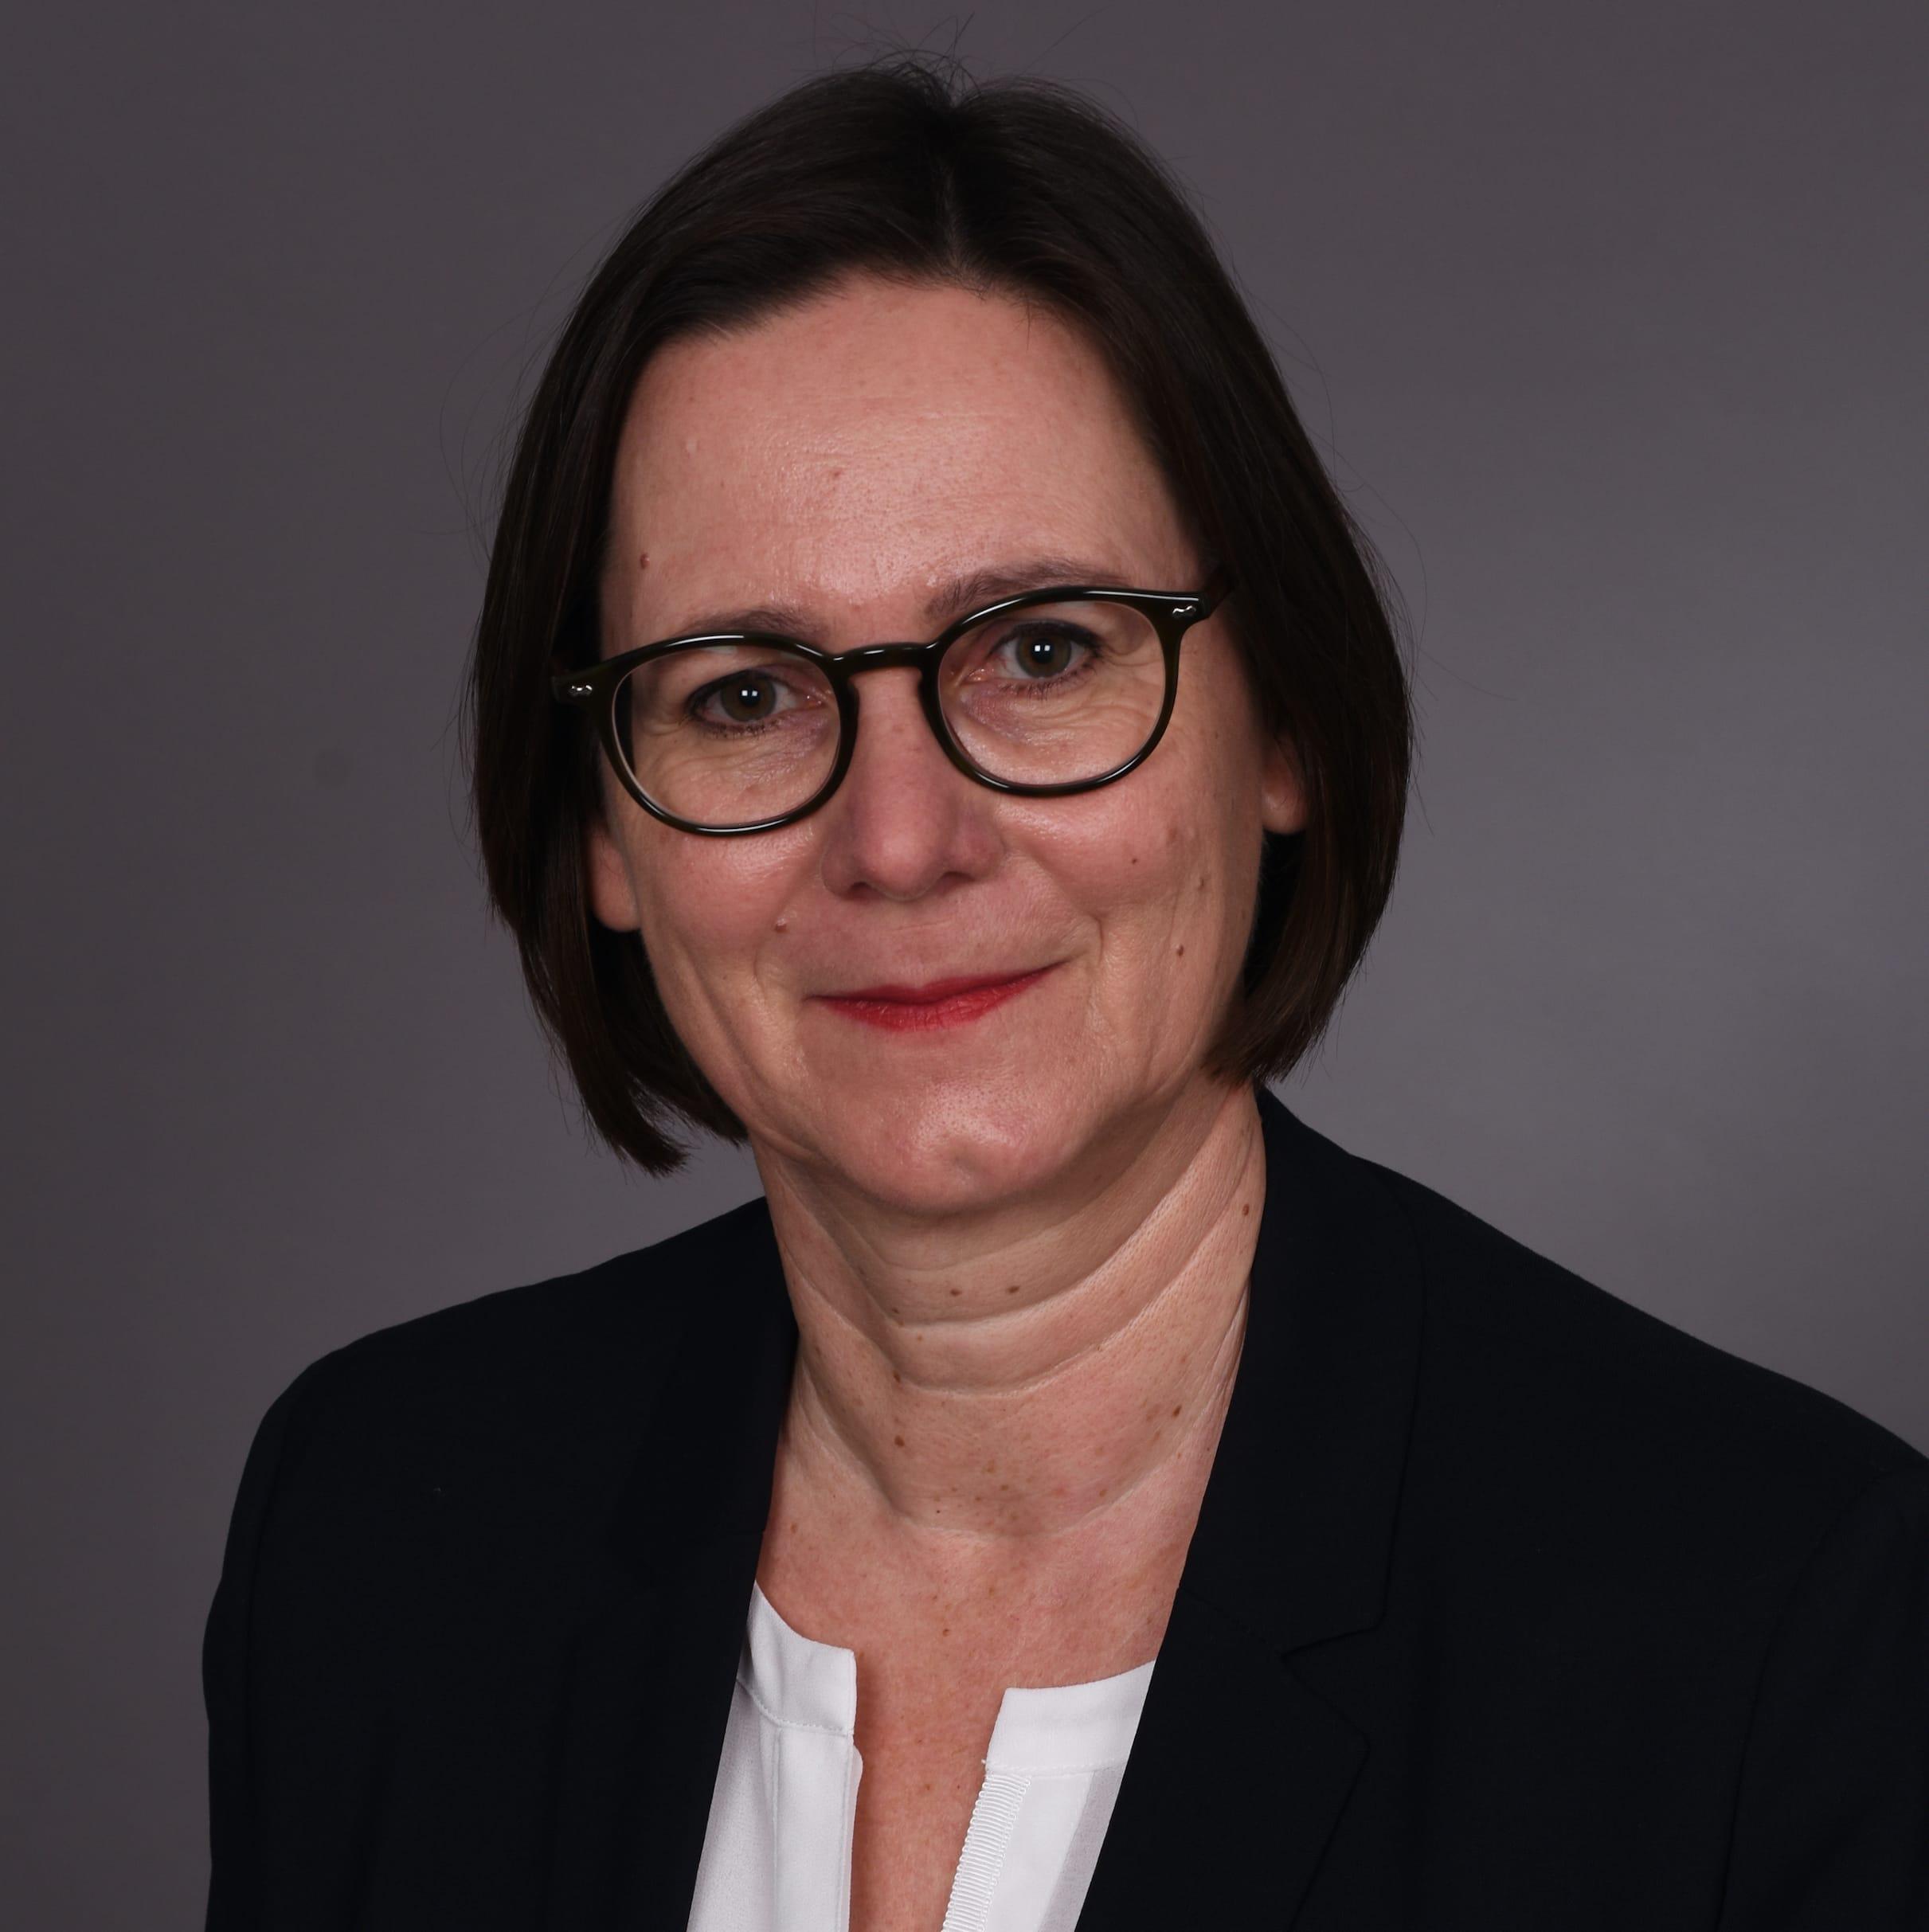 Sabine Moritz neu